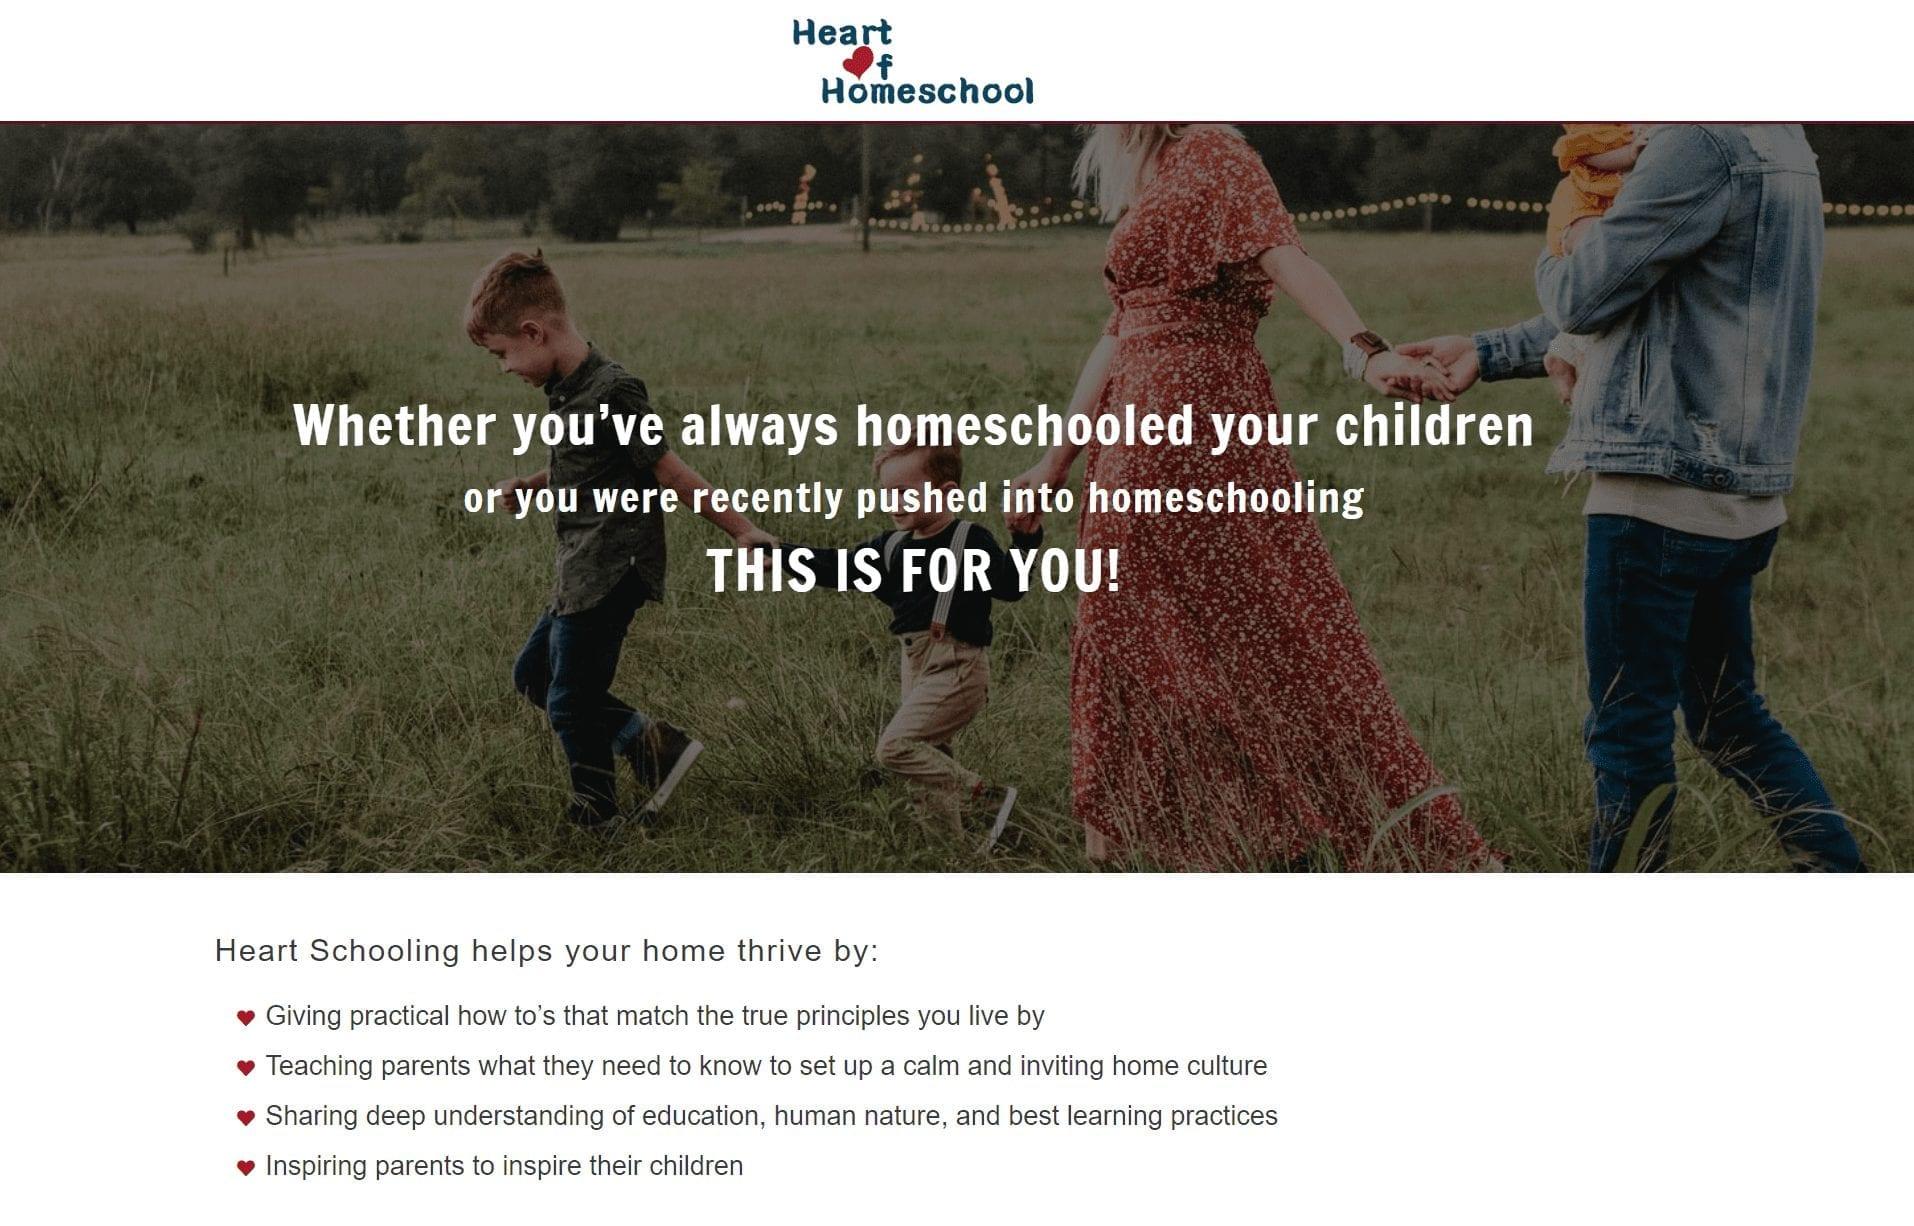 Heart of Homeschool FREE Online Seminar